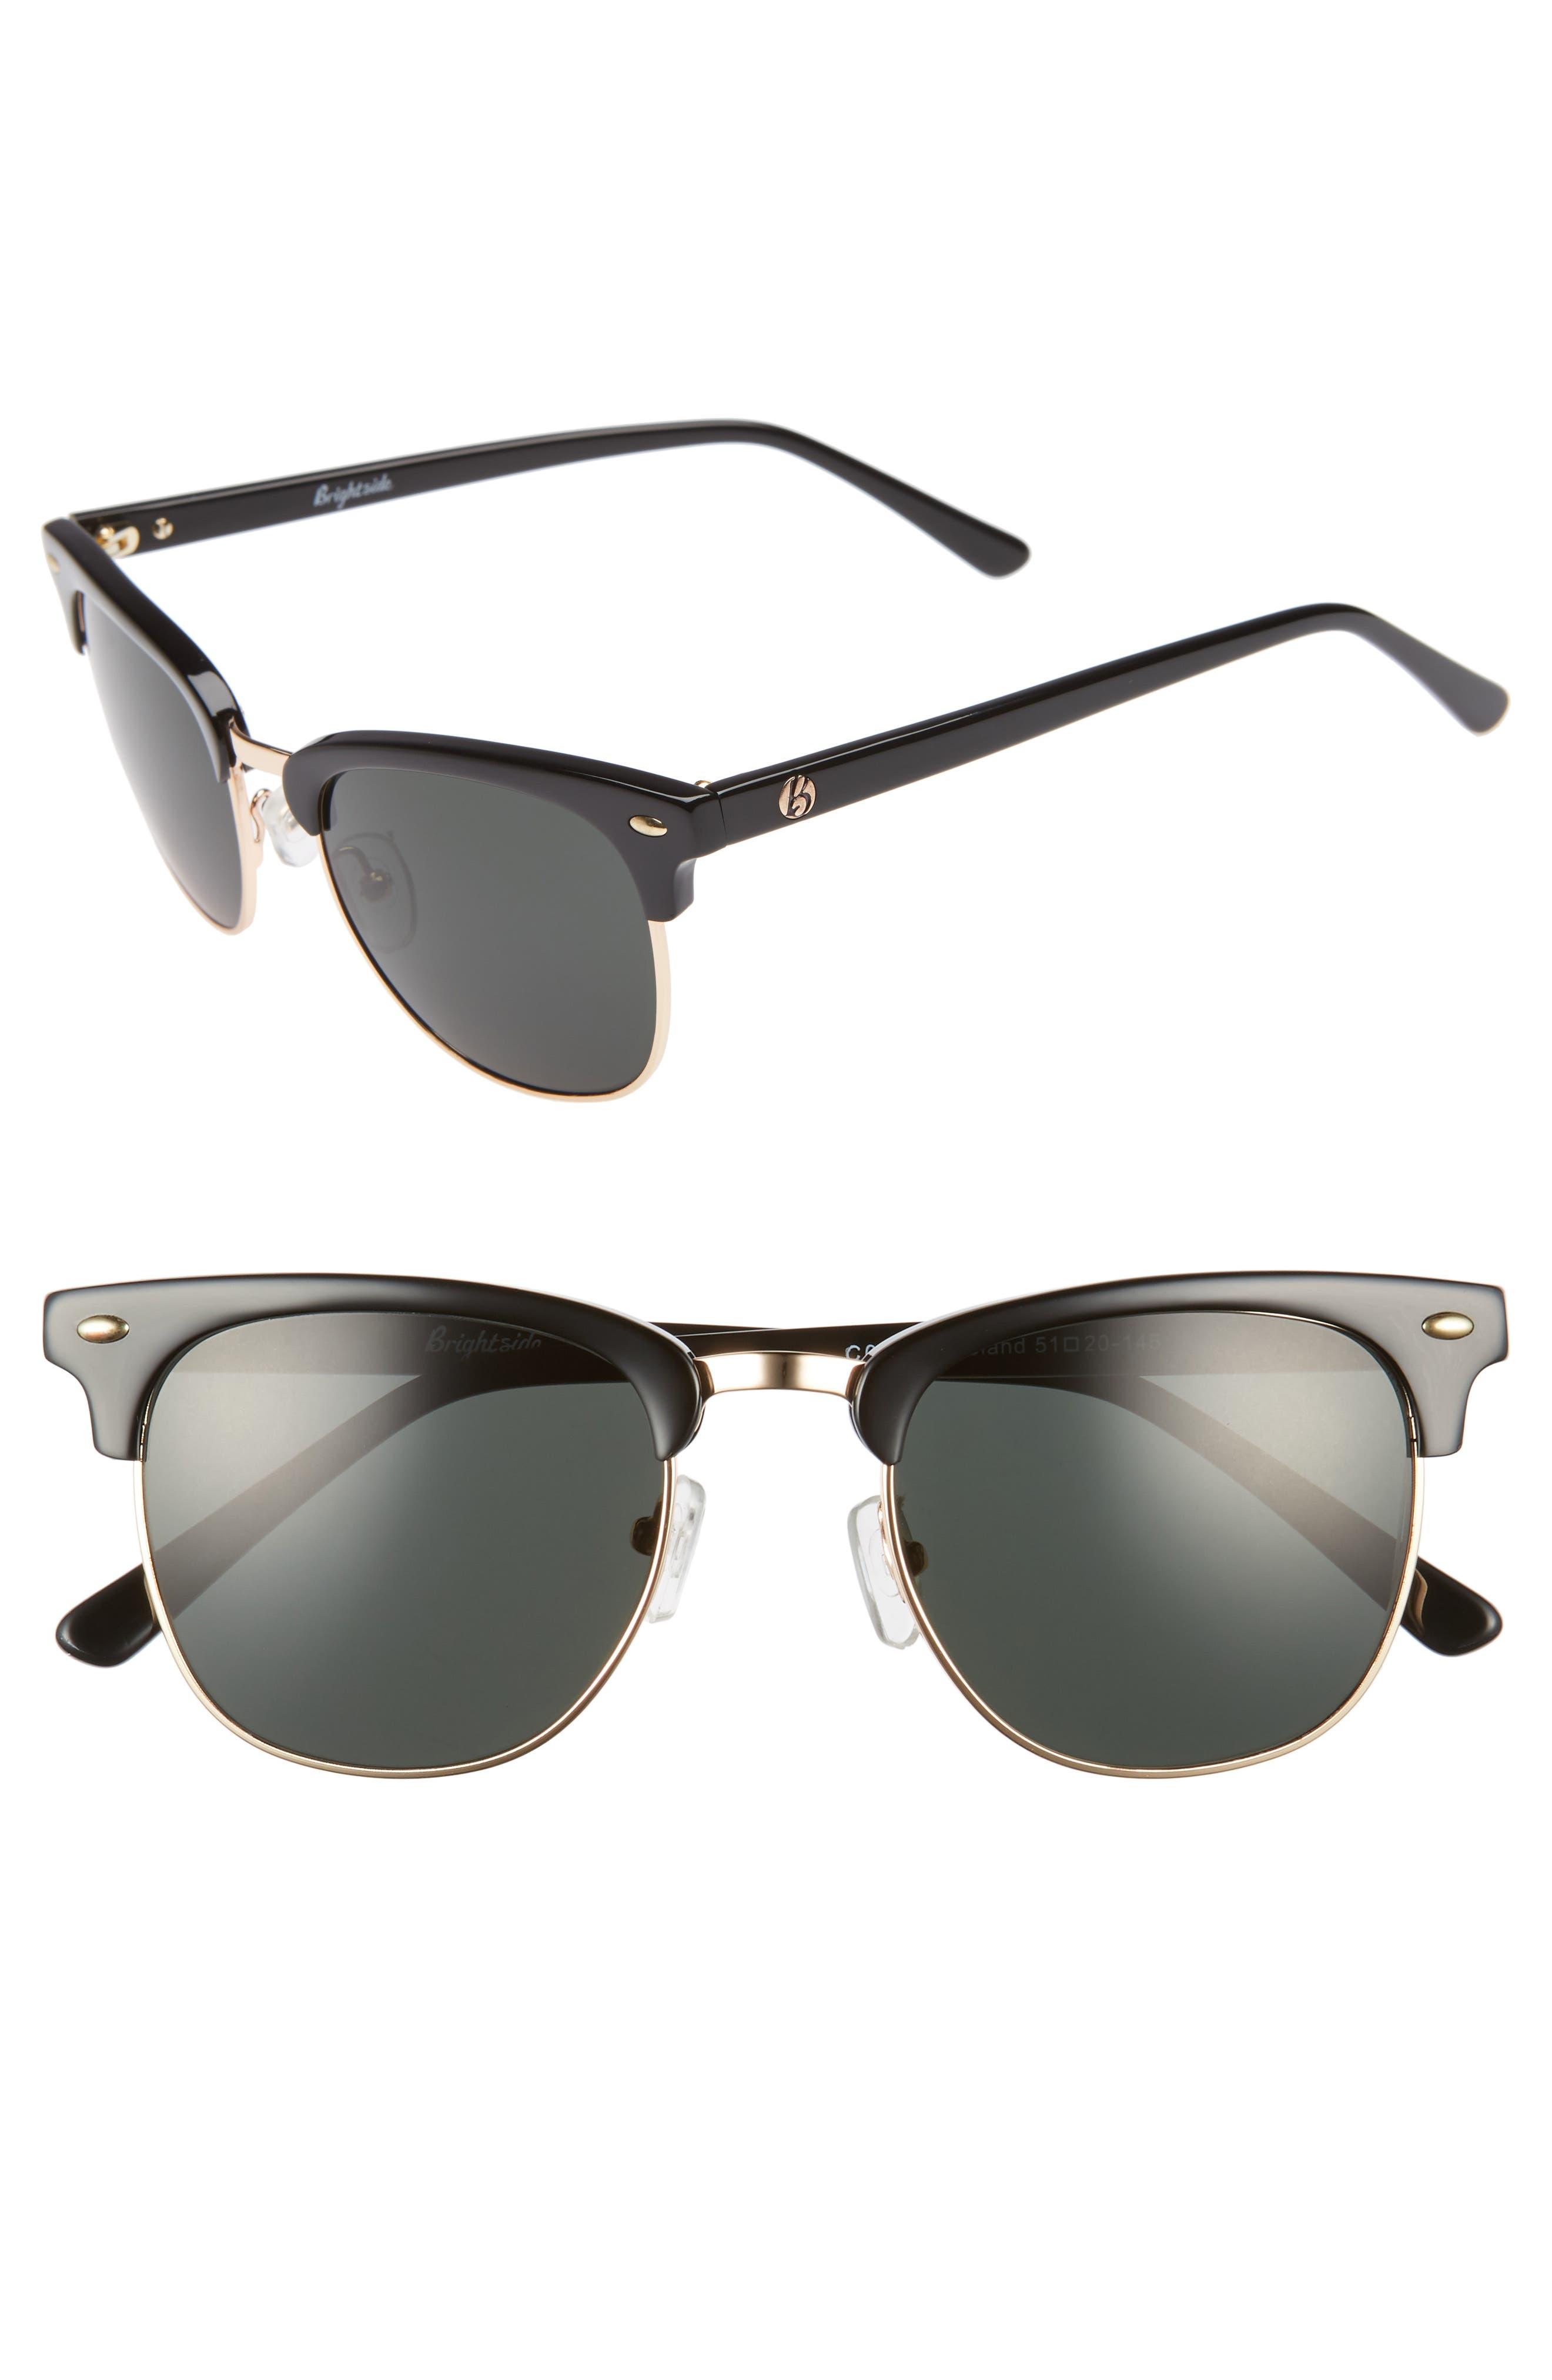 Copeland 51mm Sunglasses